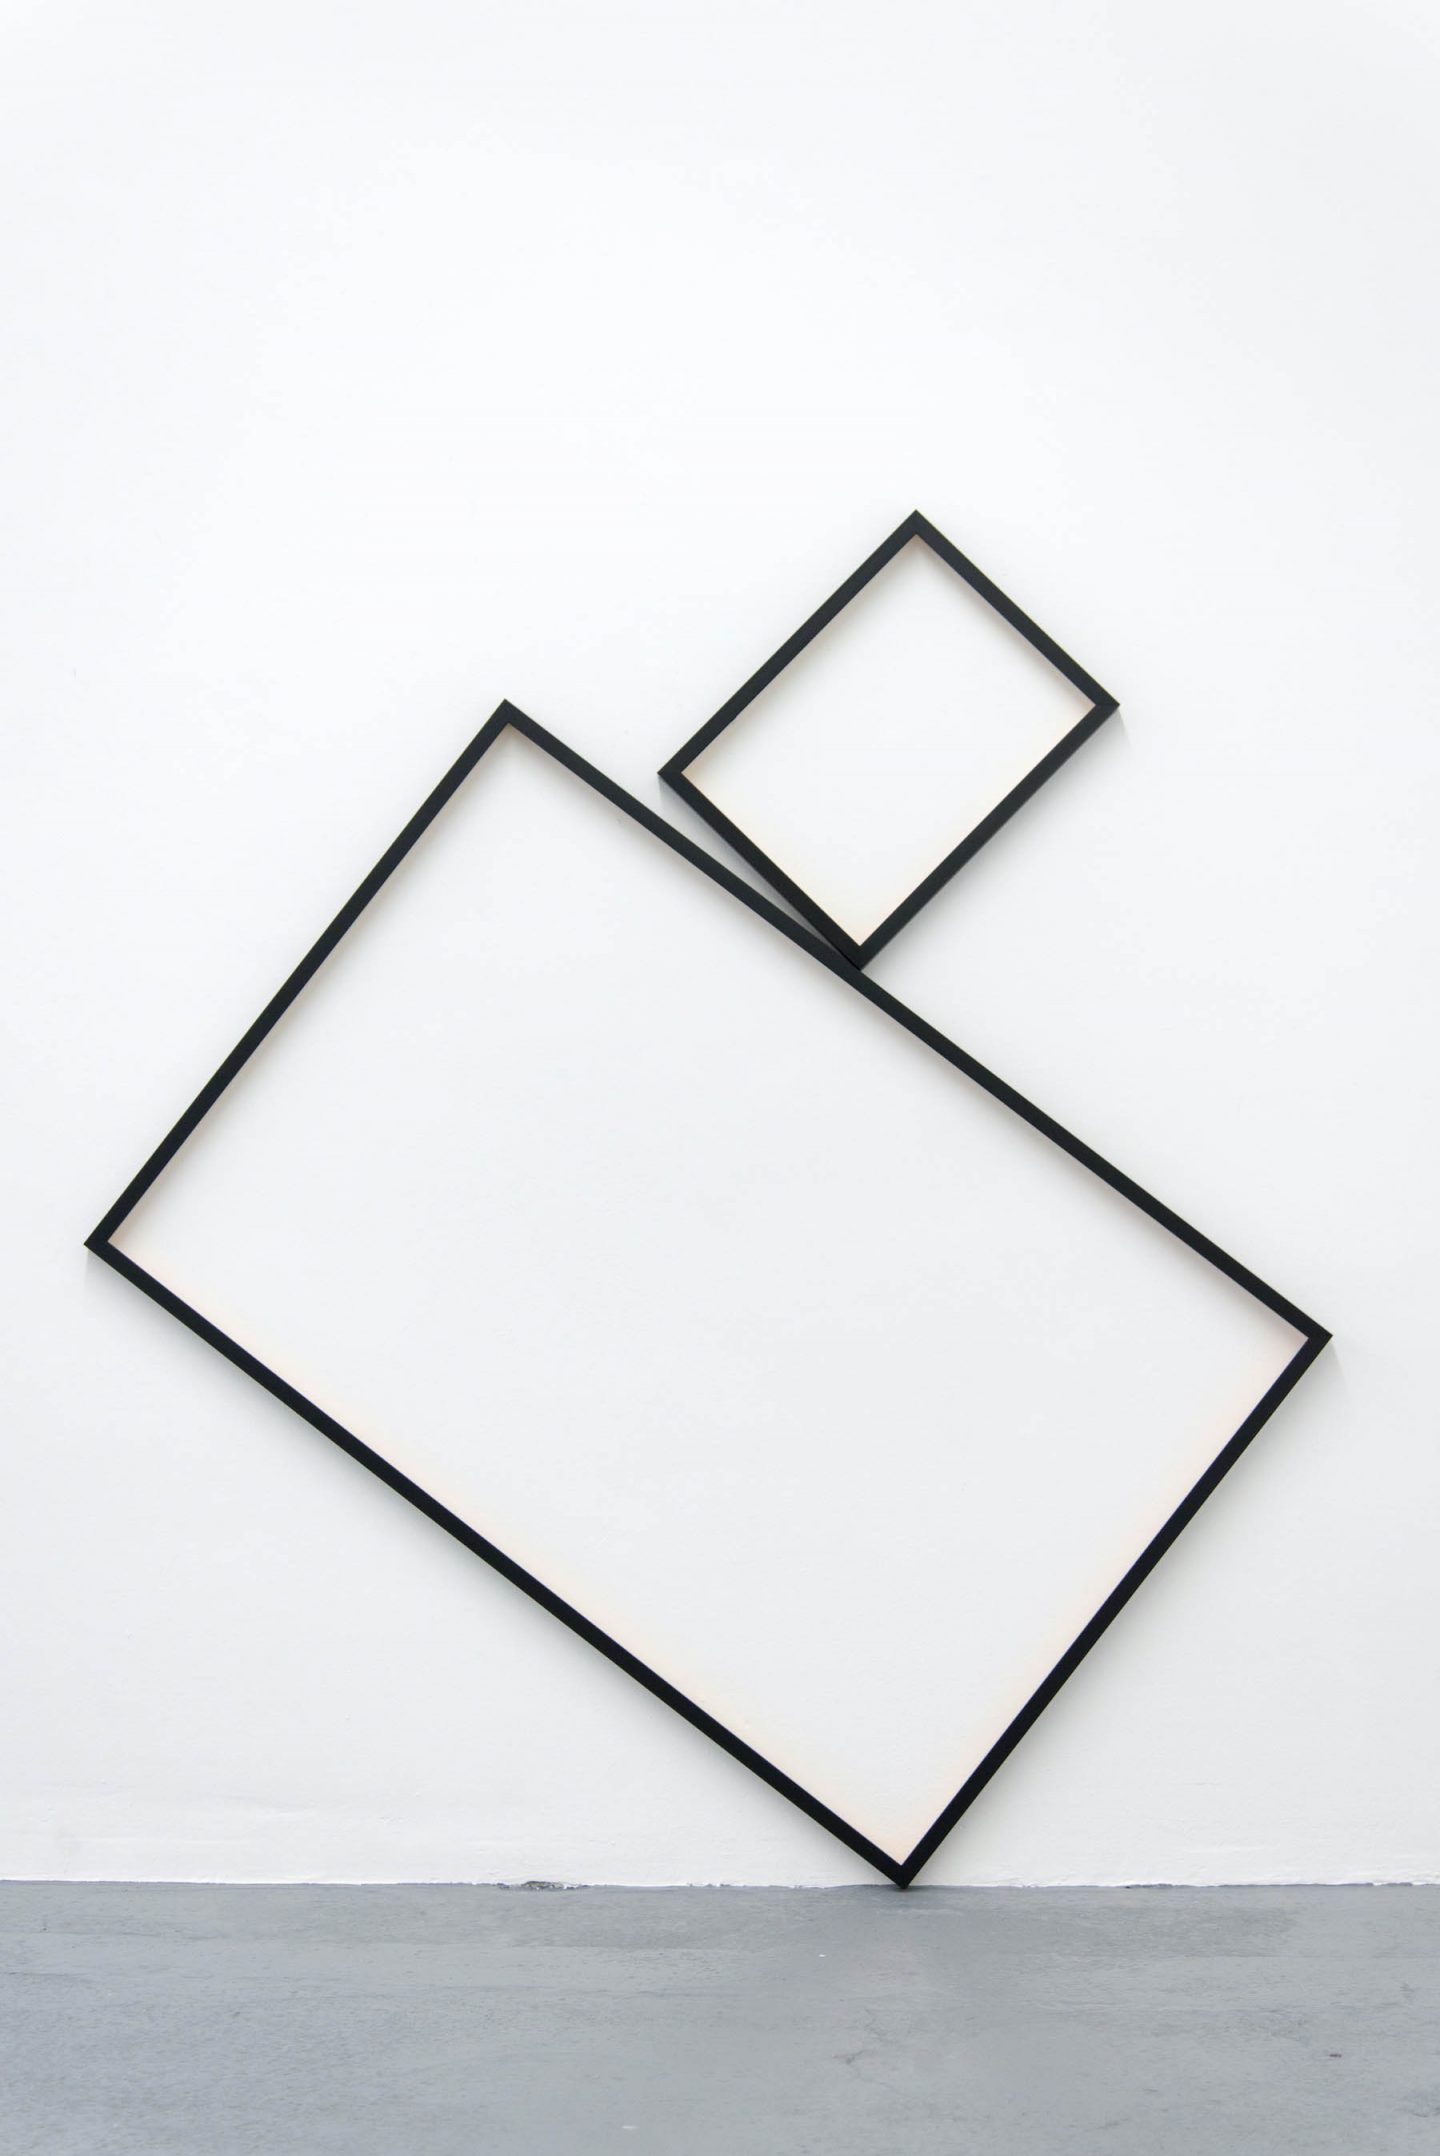 IGNANT-Art-Sali-Muller-Fragile-Gebilde-08